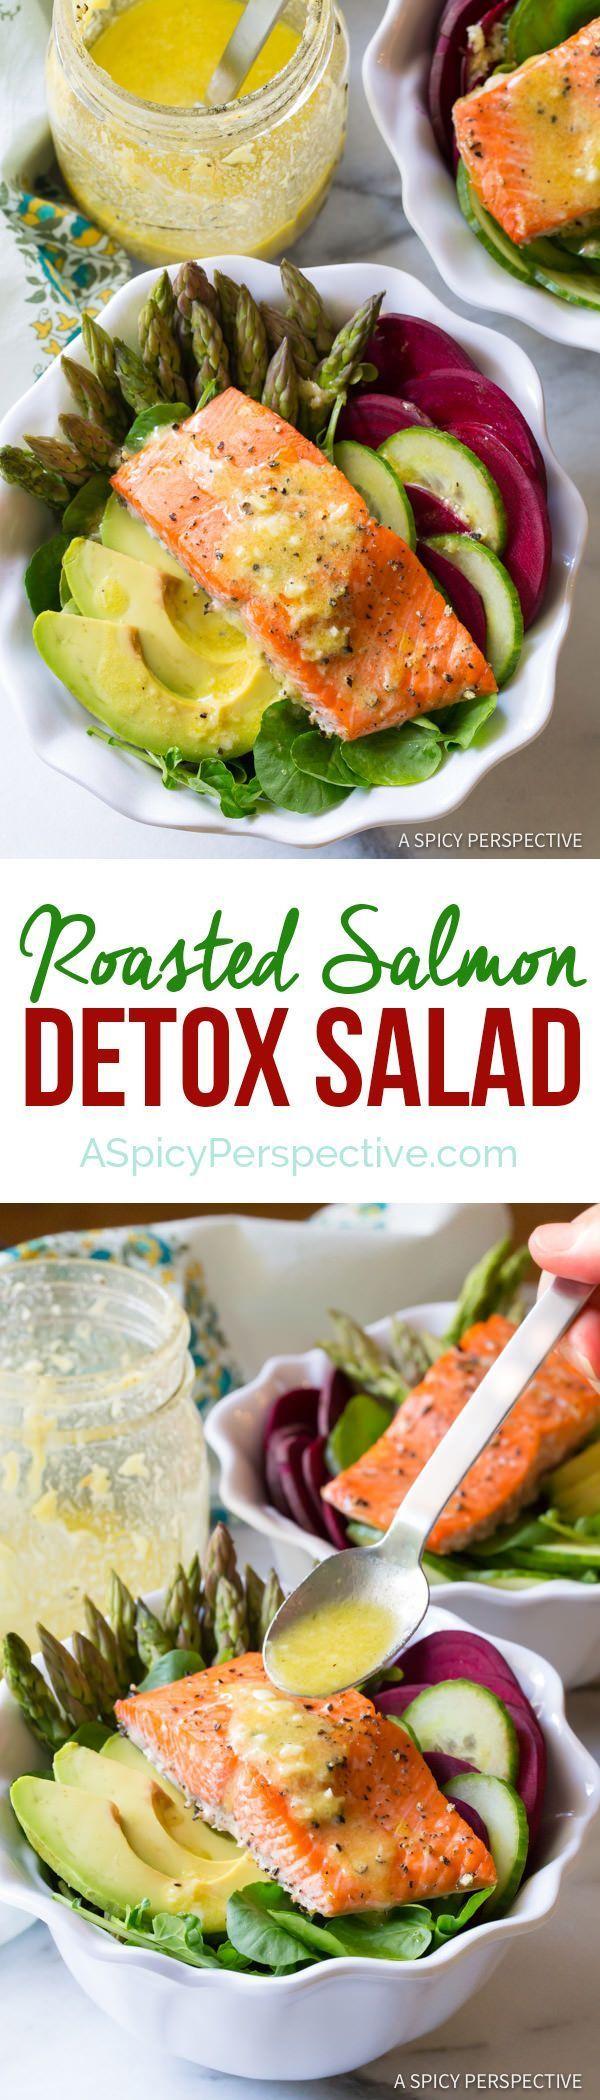 The Best Roasted Salmon Detox Salad Recipe | http://ASpicyPerspective.com